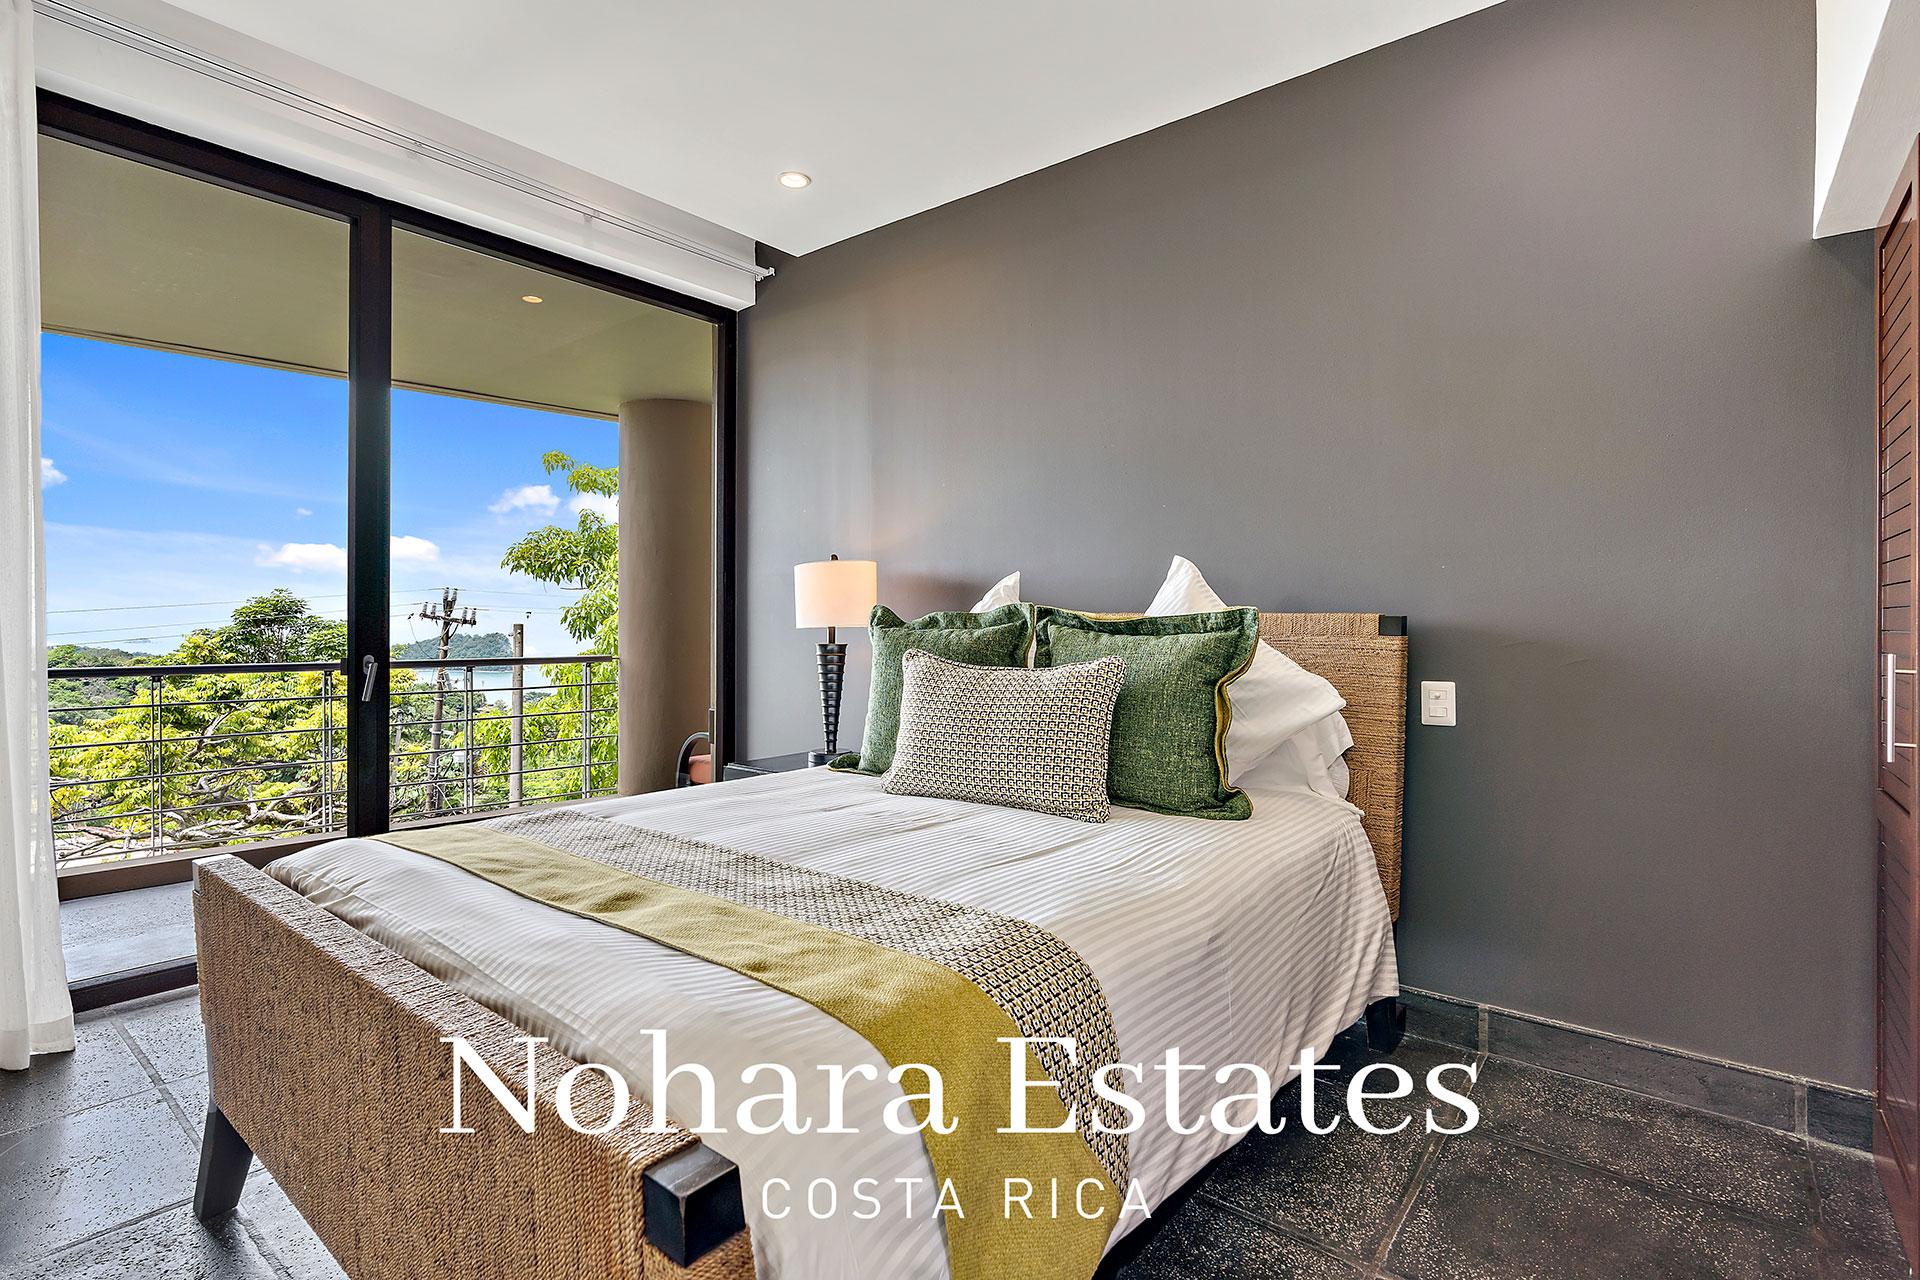 Nohara Estates Costa Rica 125 Apartment Quepos Los Altos 5